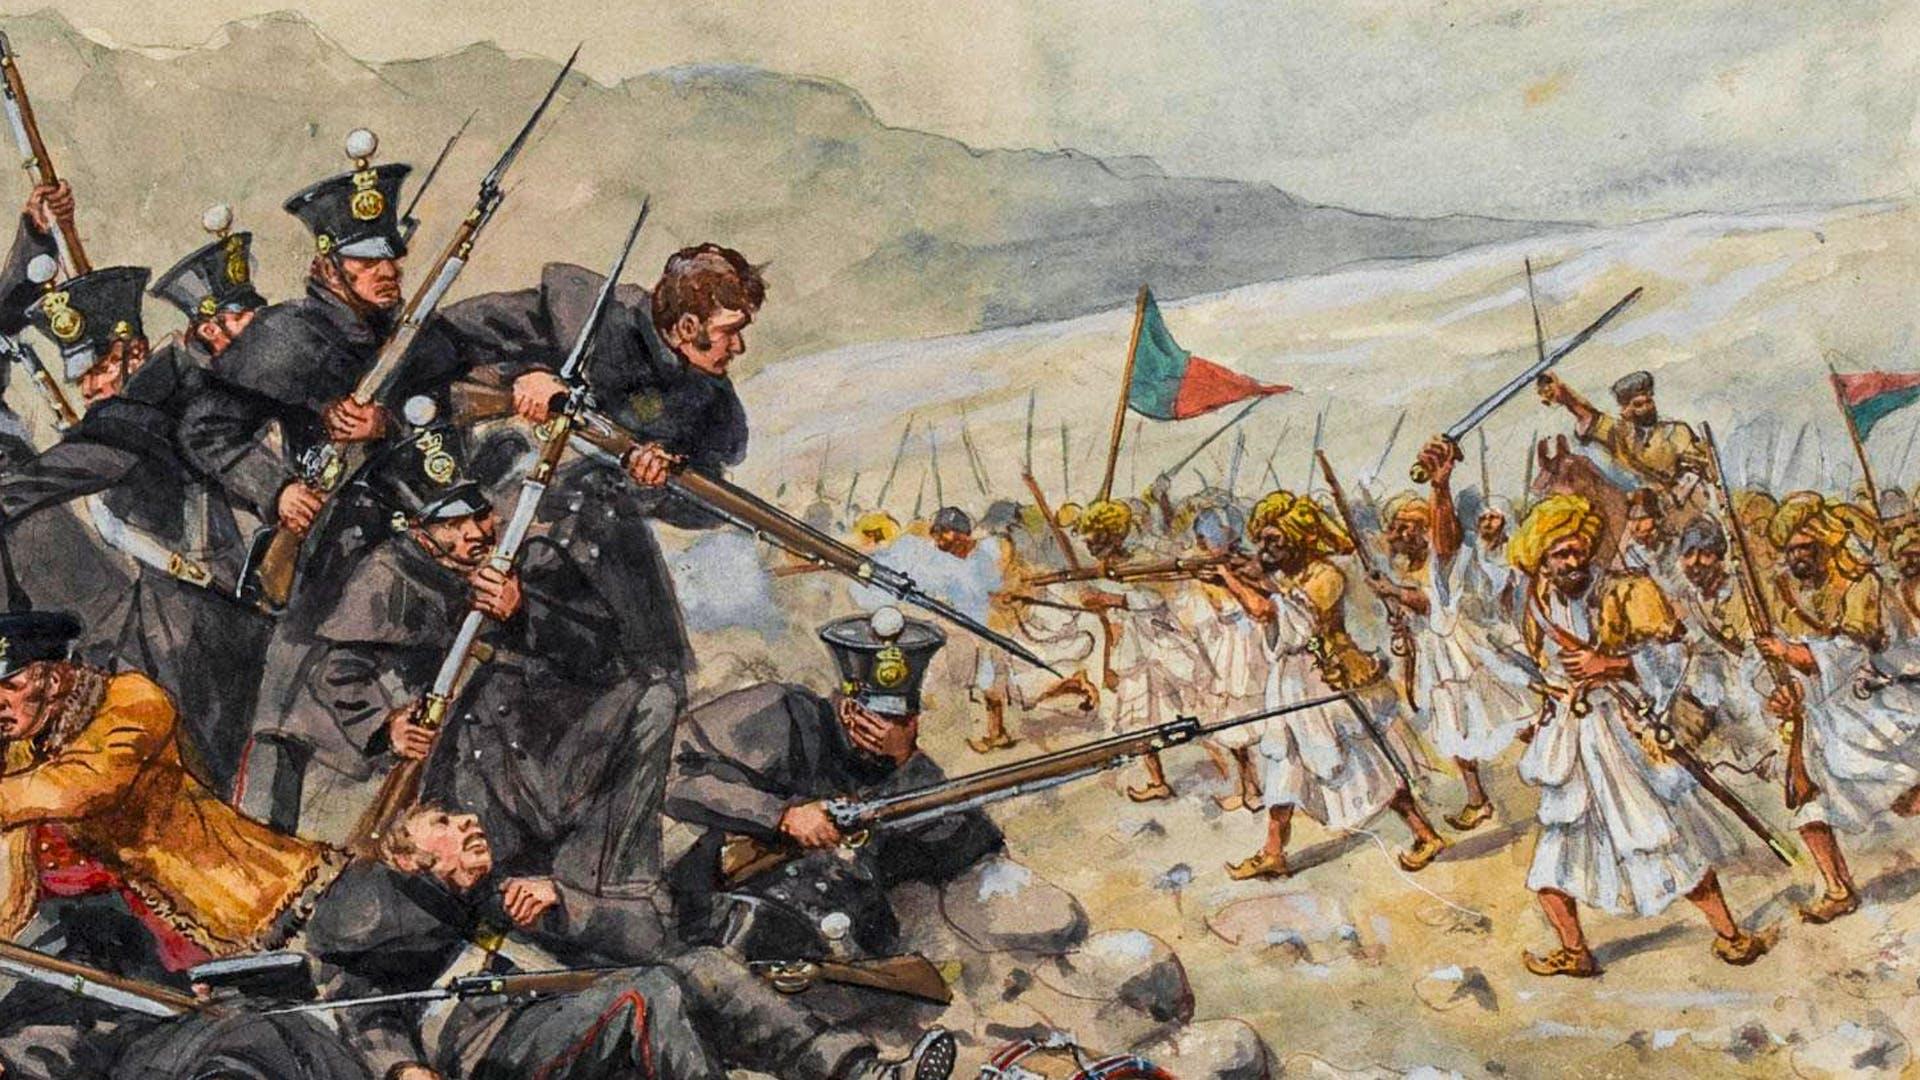 2500 144 TAB JCOY 1842 Jelalabad The Last Stand 02 2x